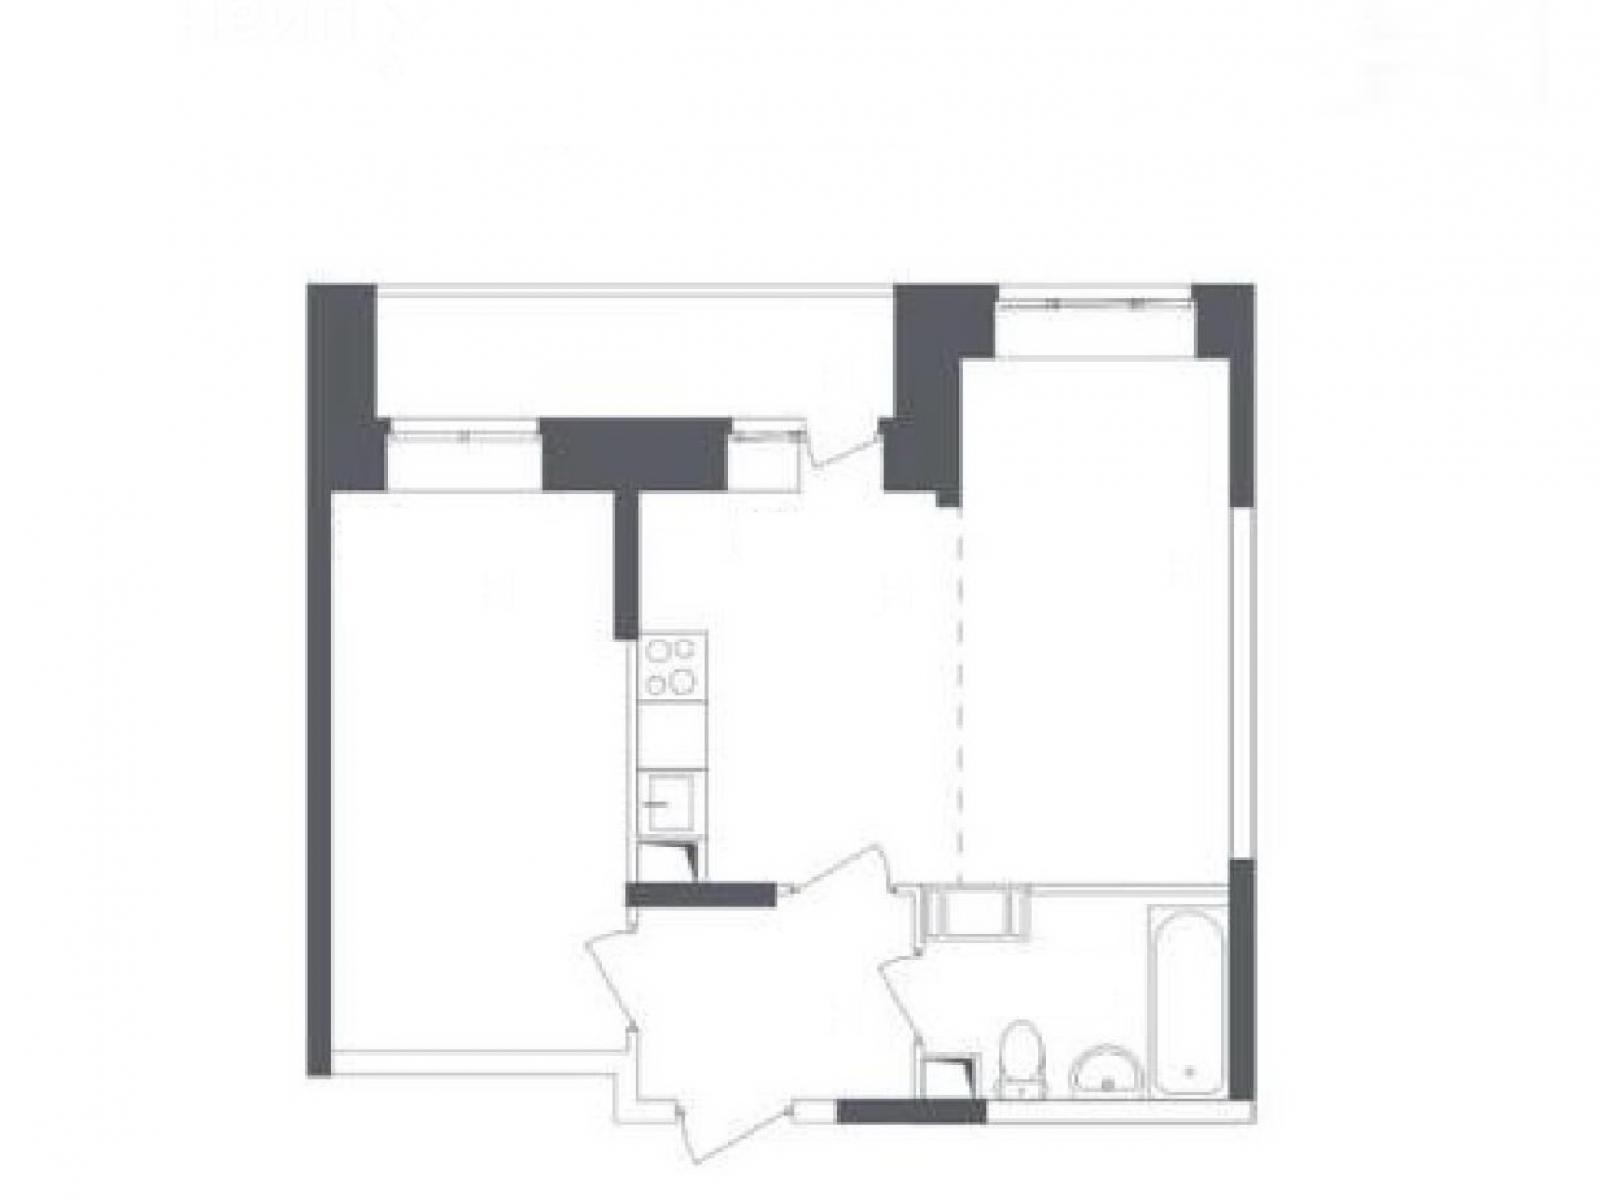 Фото №2 - 2-комнатная квартира, Люберцы, Камова улица 9 корпус 2, метро Некрасовка